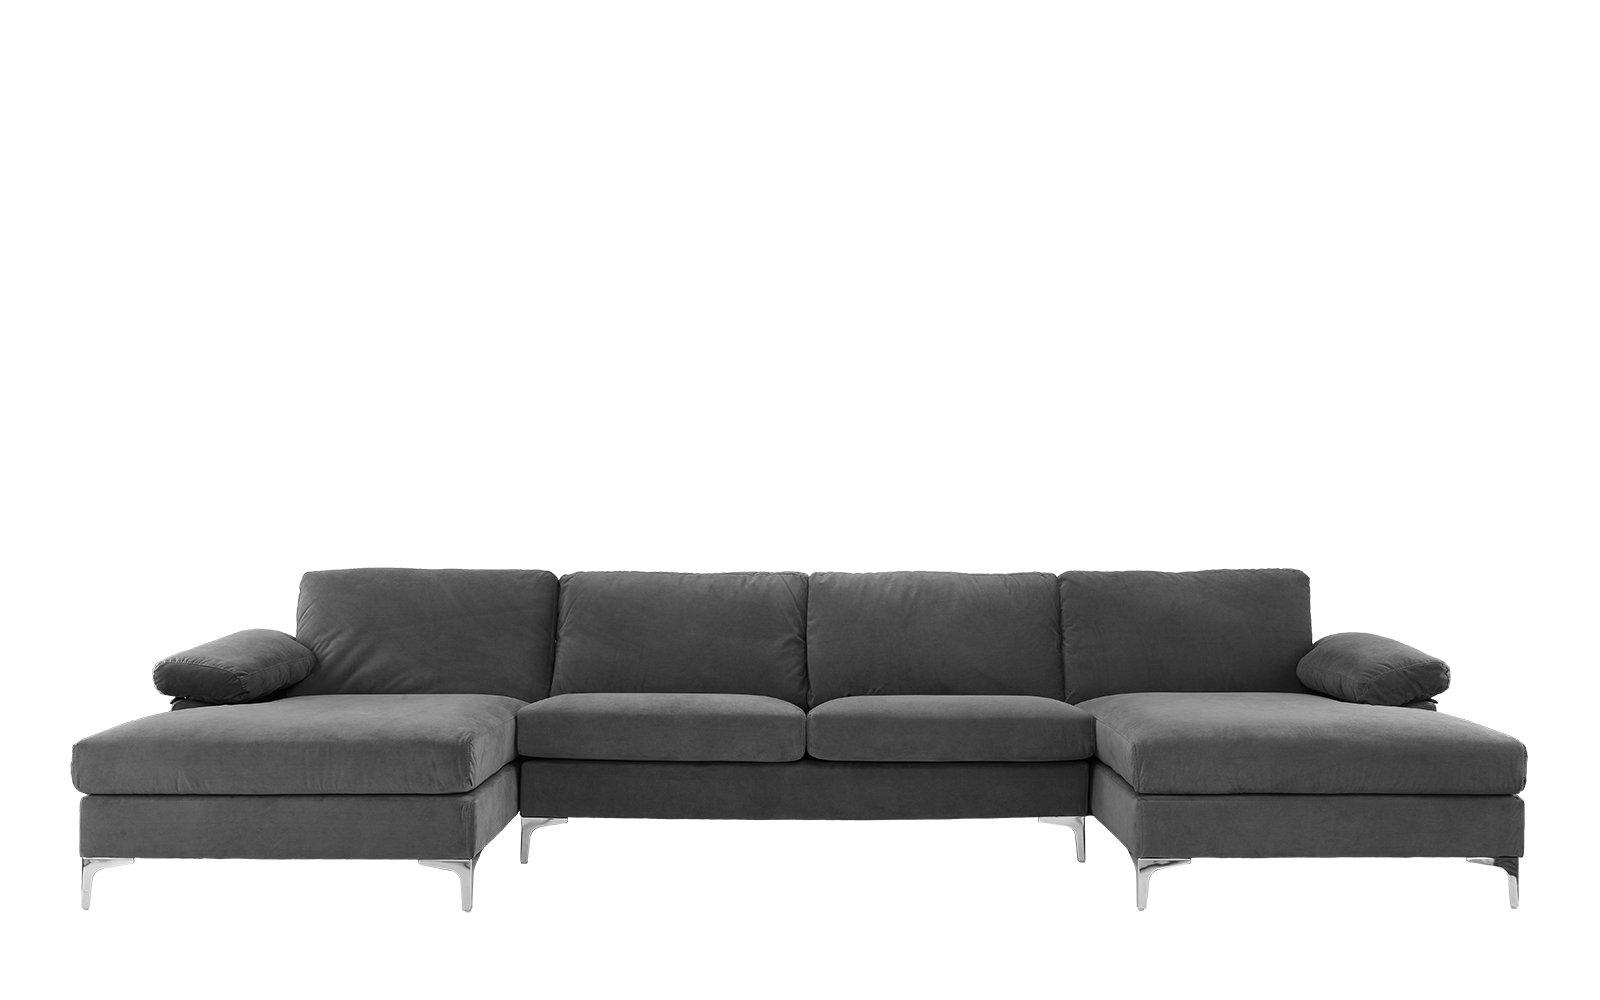 Amanda Xl Modern Velvet Large Sectional Sofa Grey U Shaped Sectional Sofa Modern Velvet Sofa Sectional Sofa